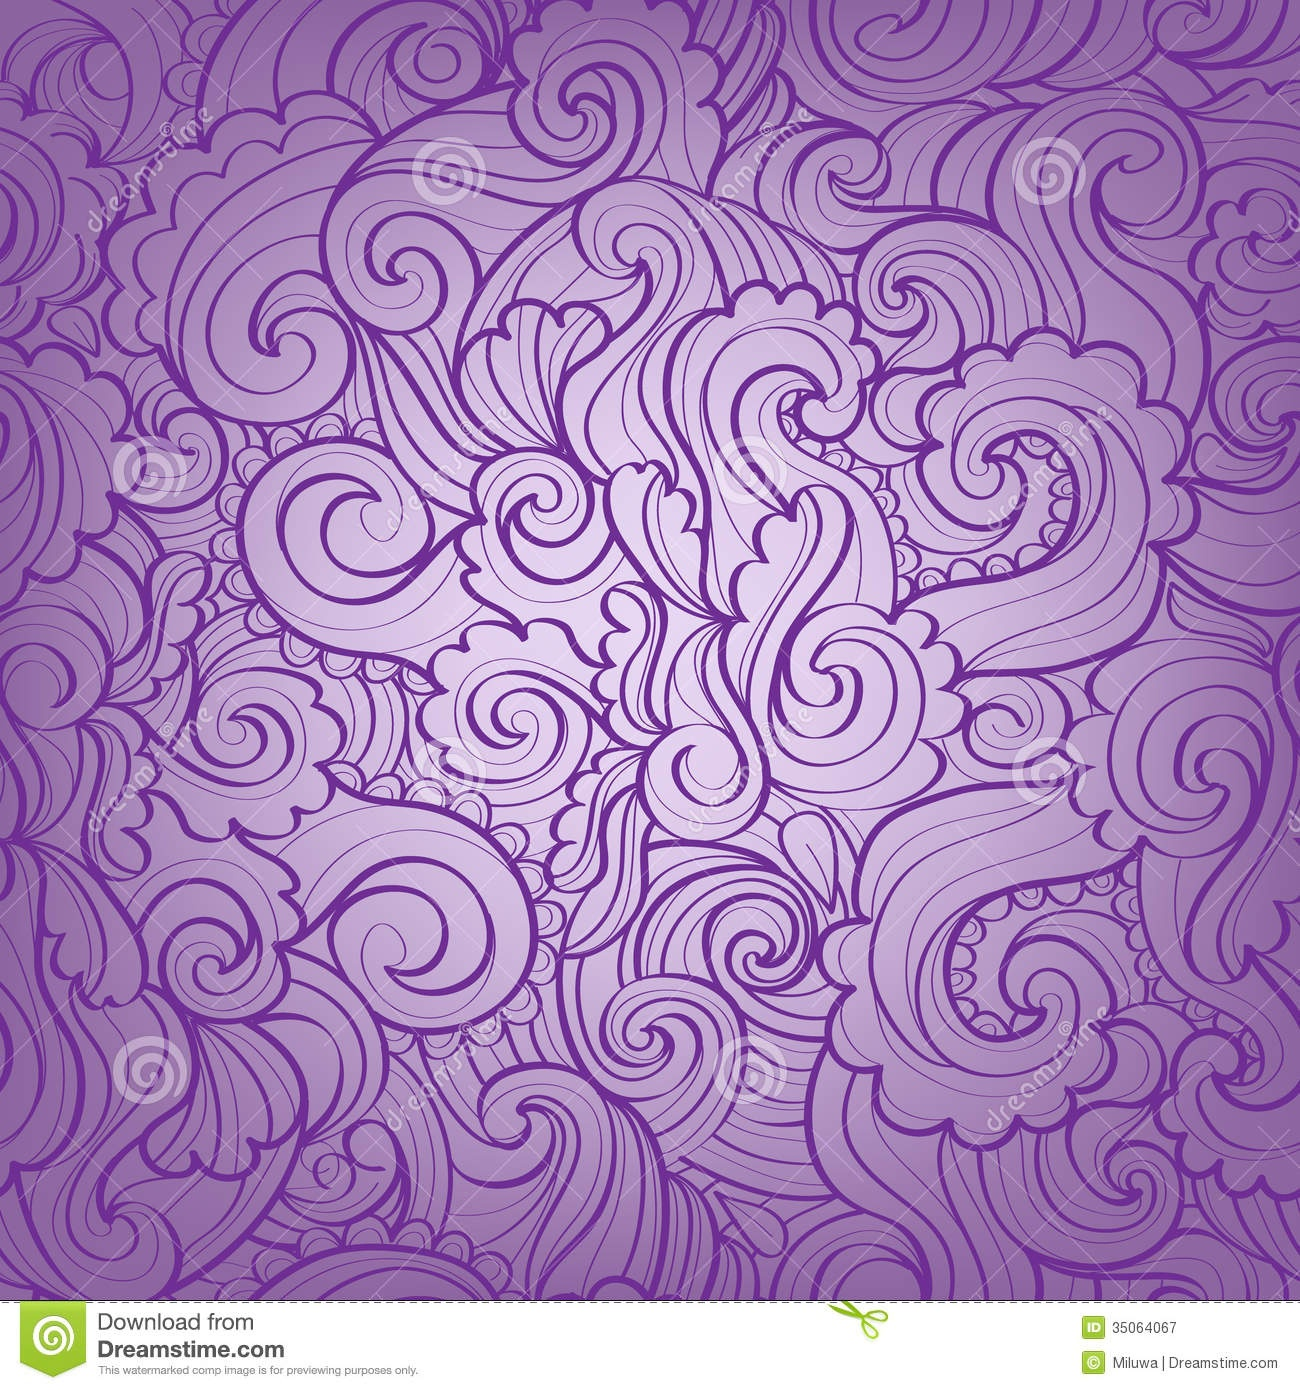 Free Printable Wallpaper Designs - Wallpapersafari - Free Printable Wallpaper Patterns